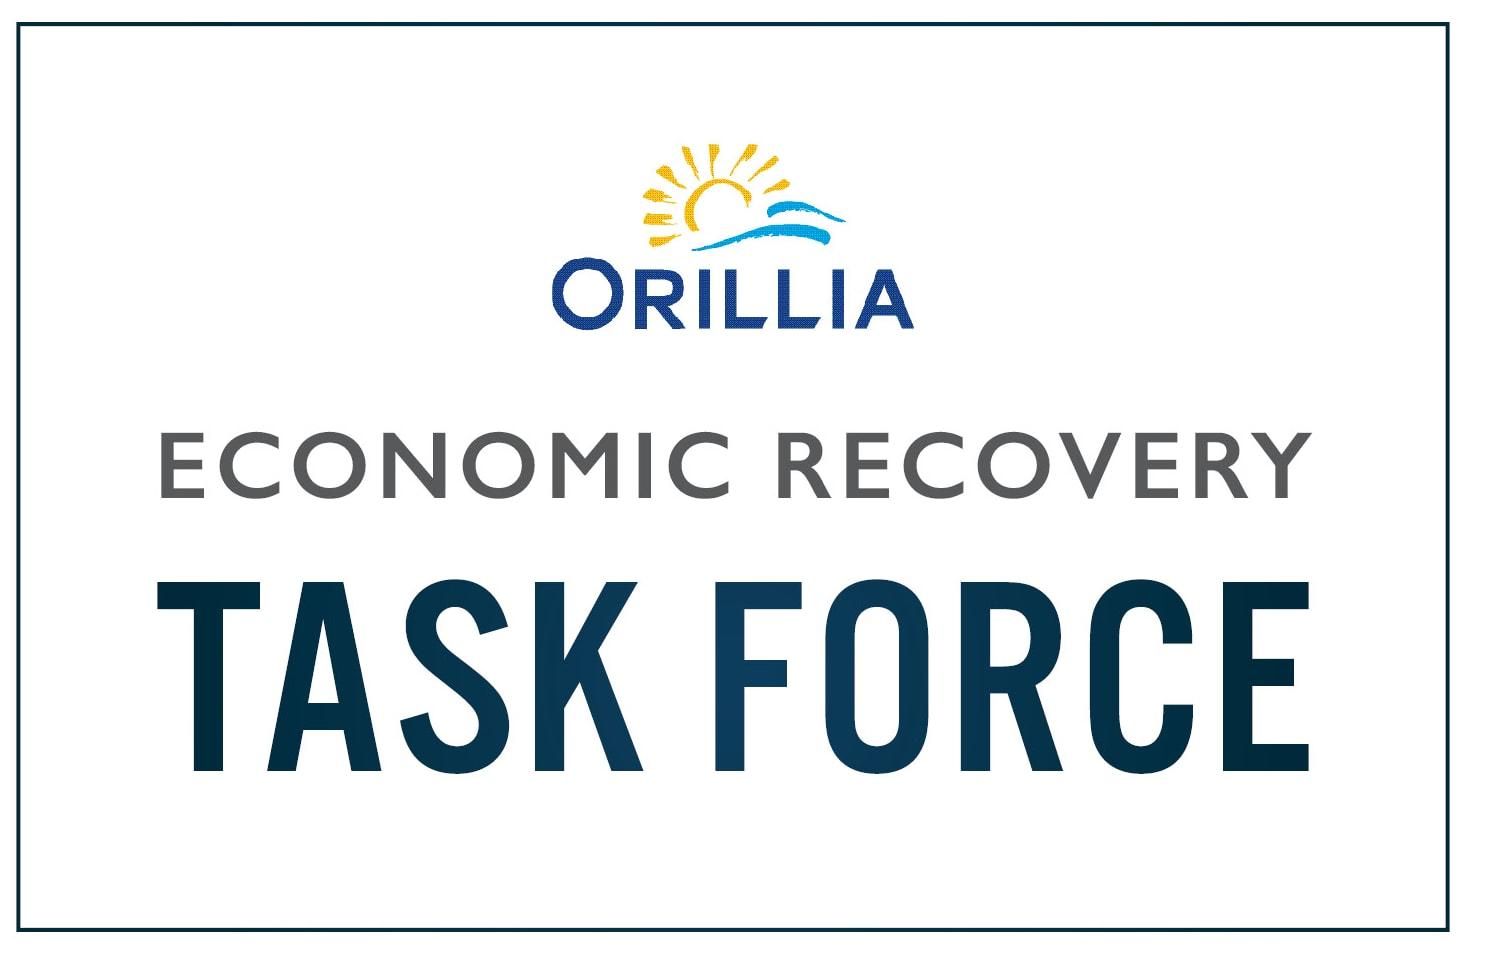 Orillia-Economic-Recovery-Task-Force-Logo(1)-w1050.jpg